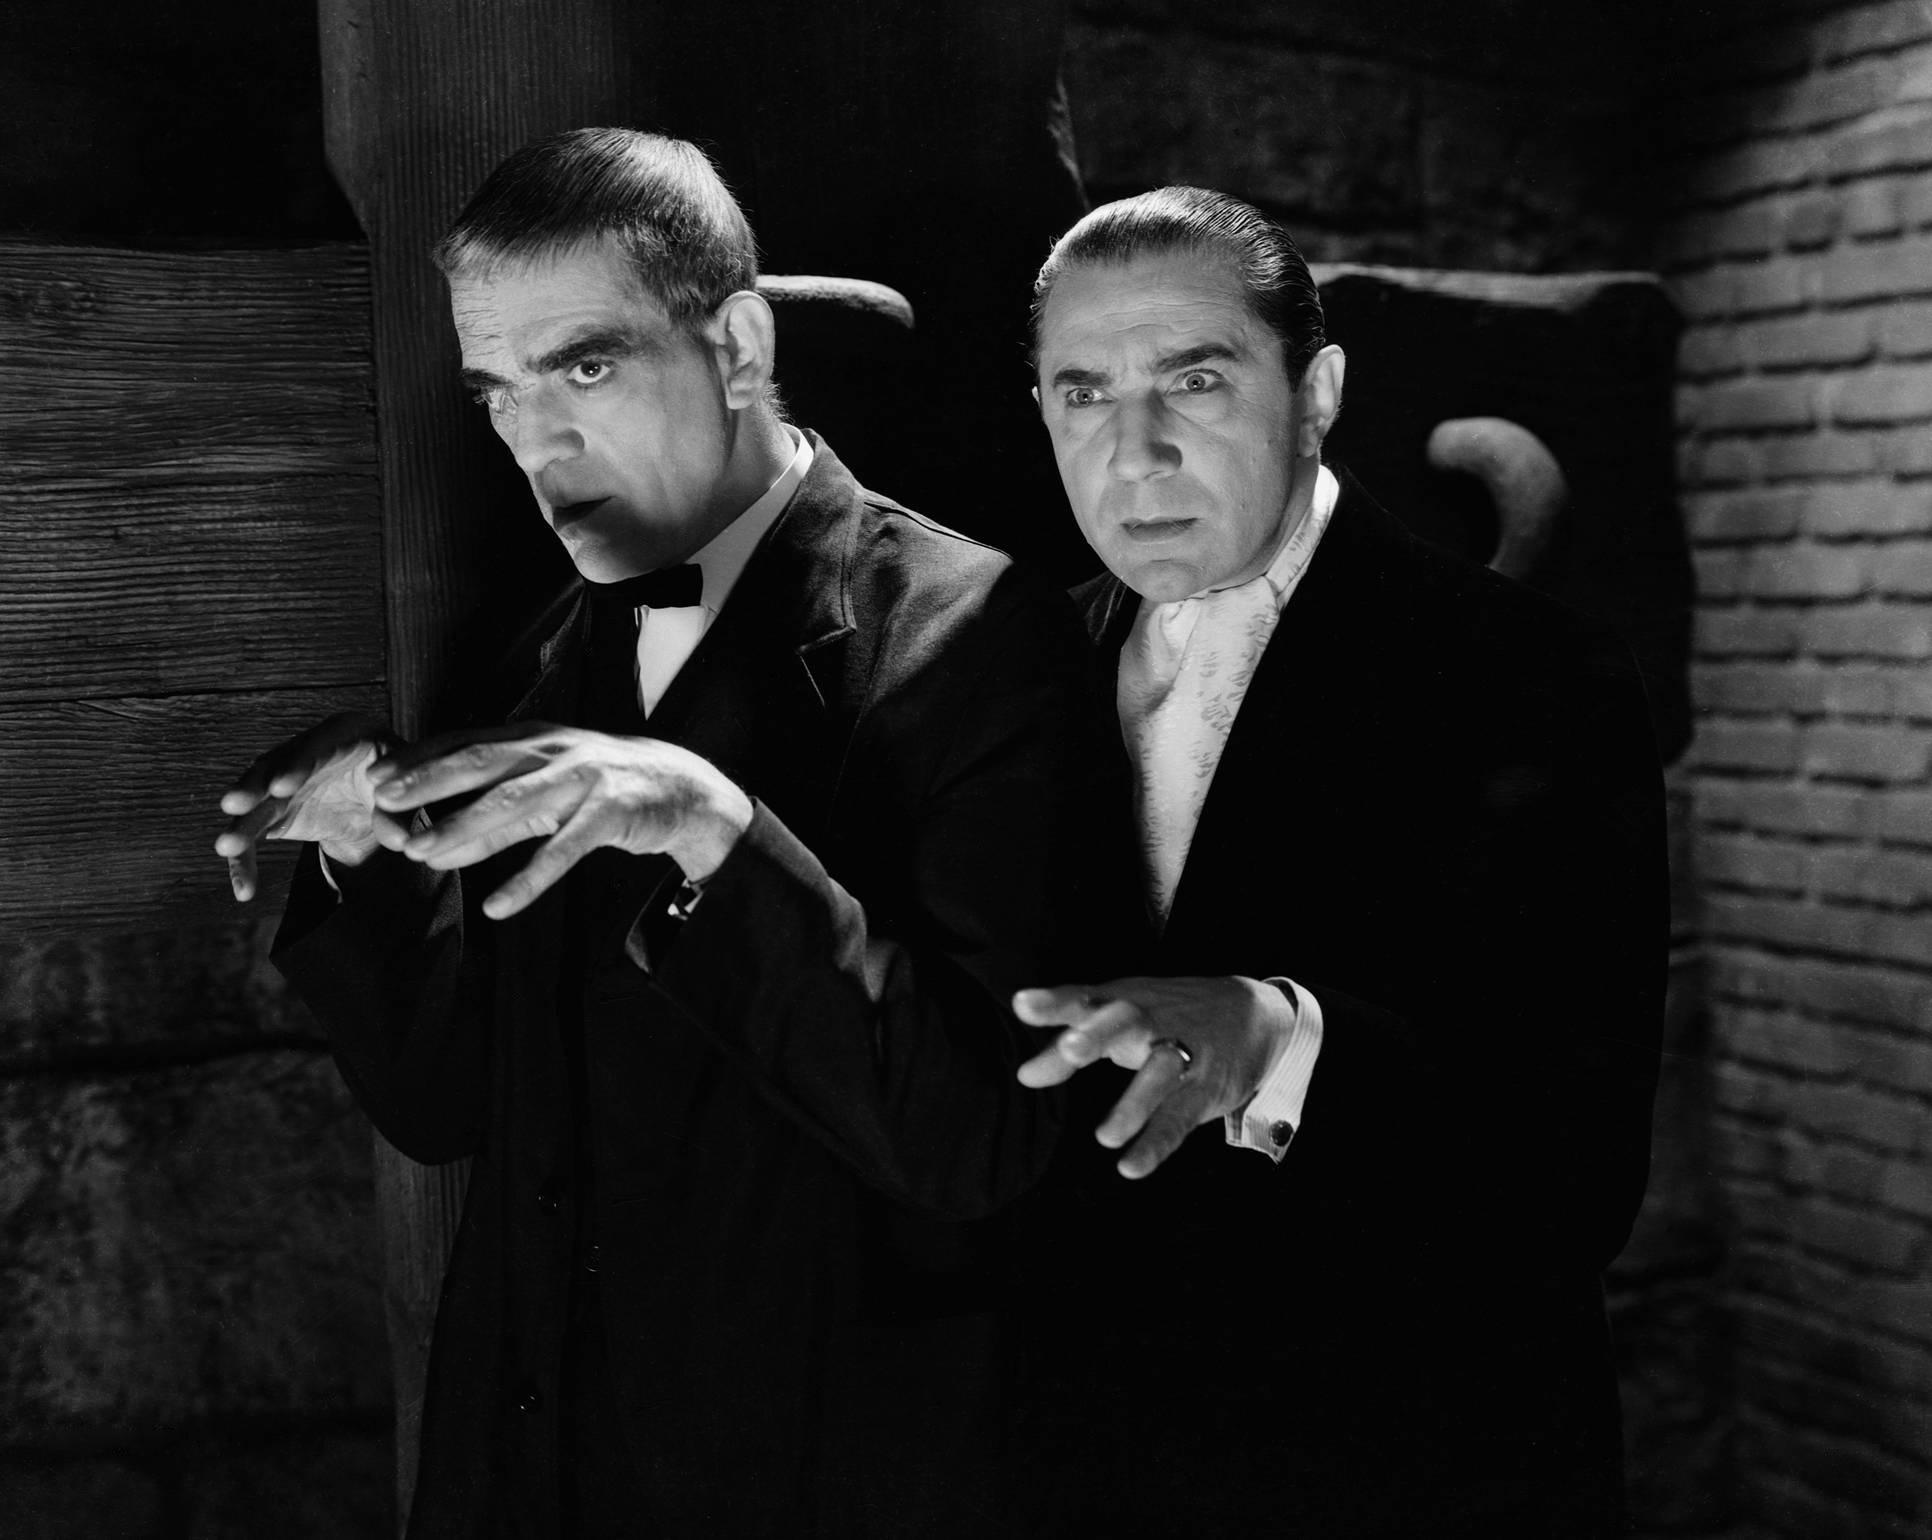 Boris Karloff et Bela Lugosi dans le film Le Corbeau (Lew Landers, 1935)